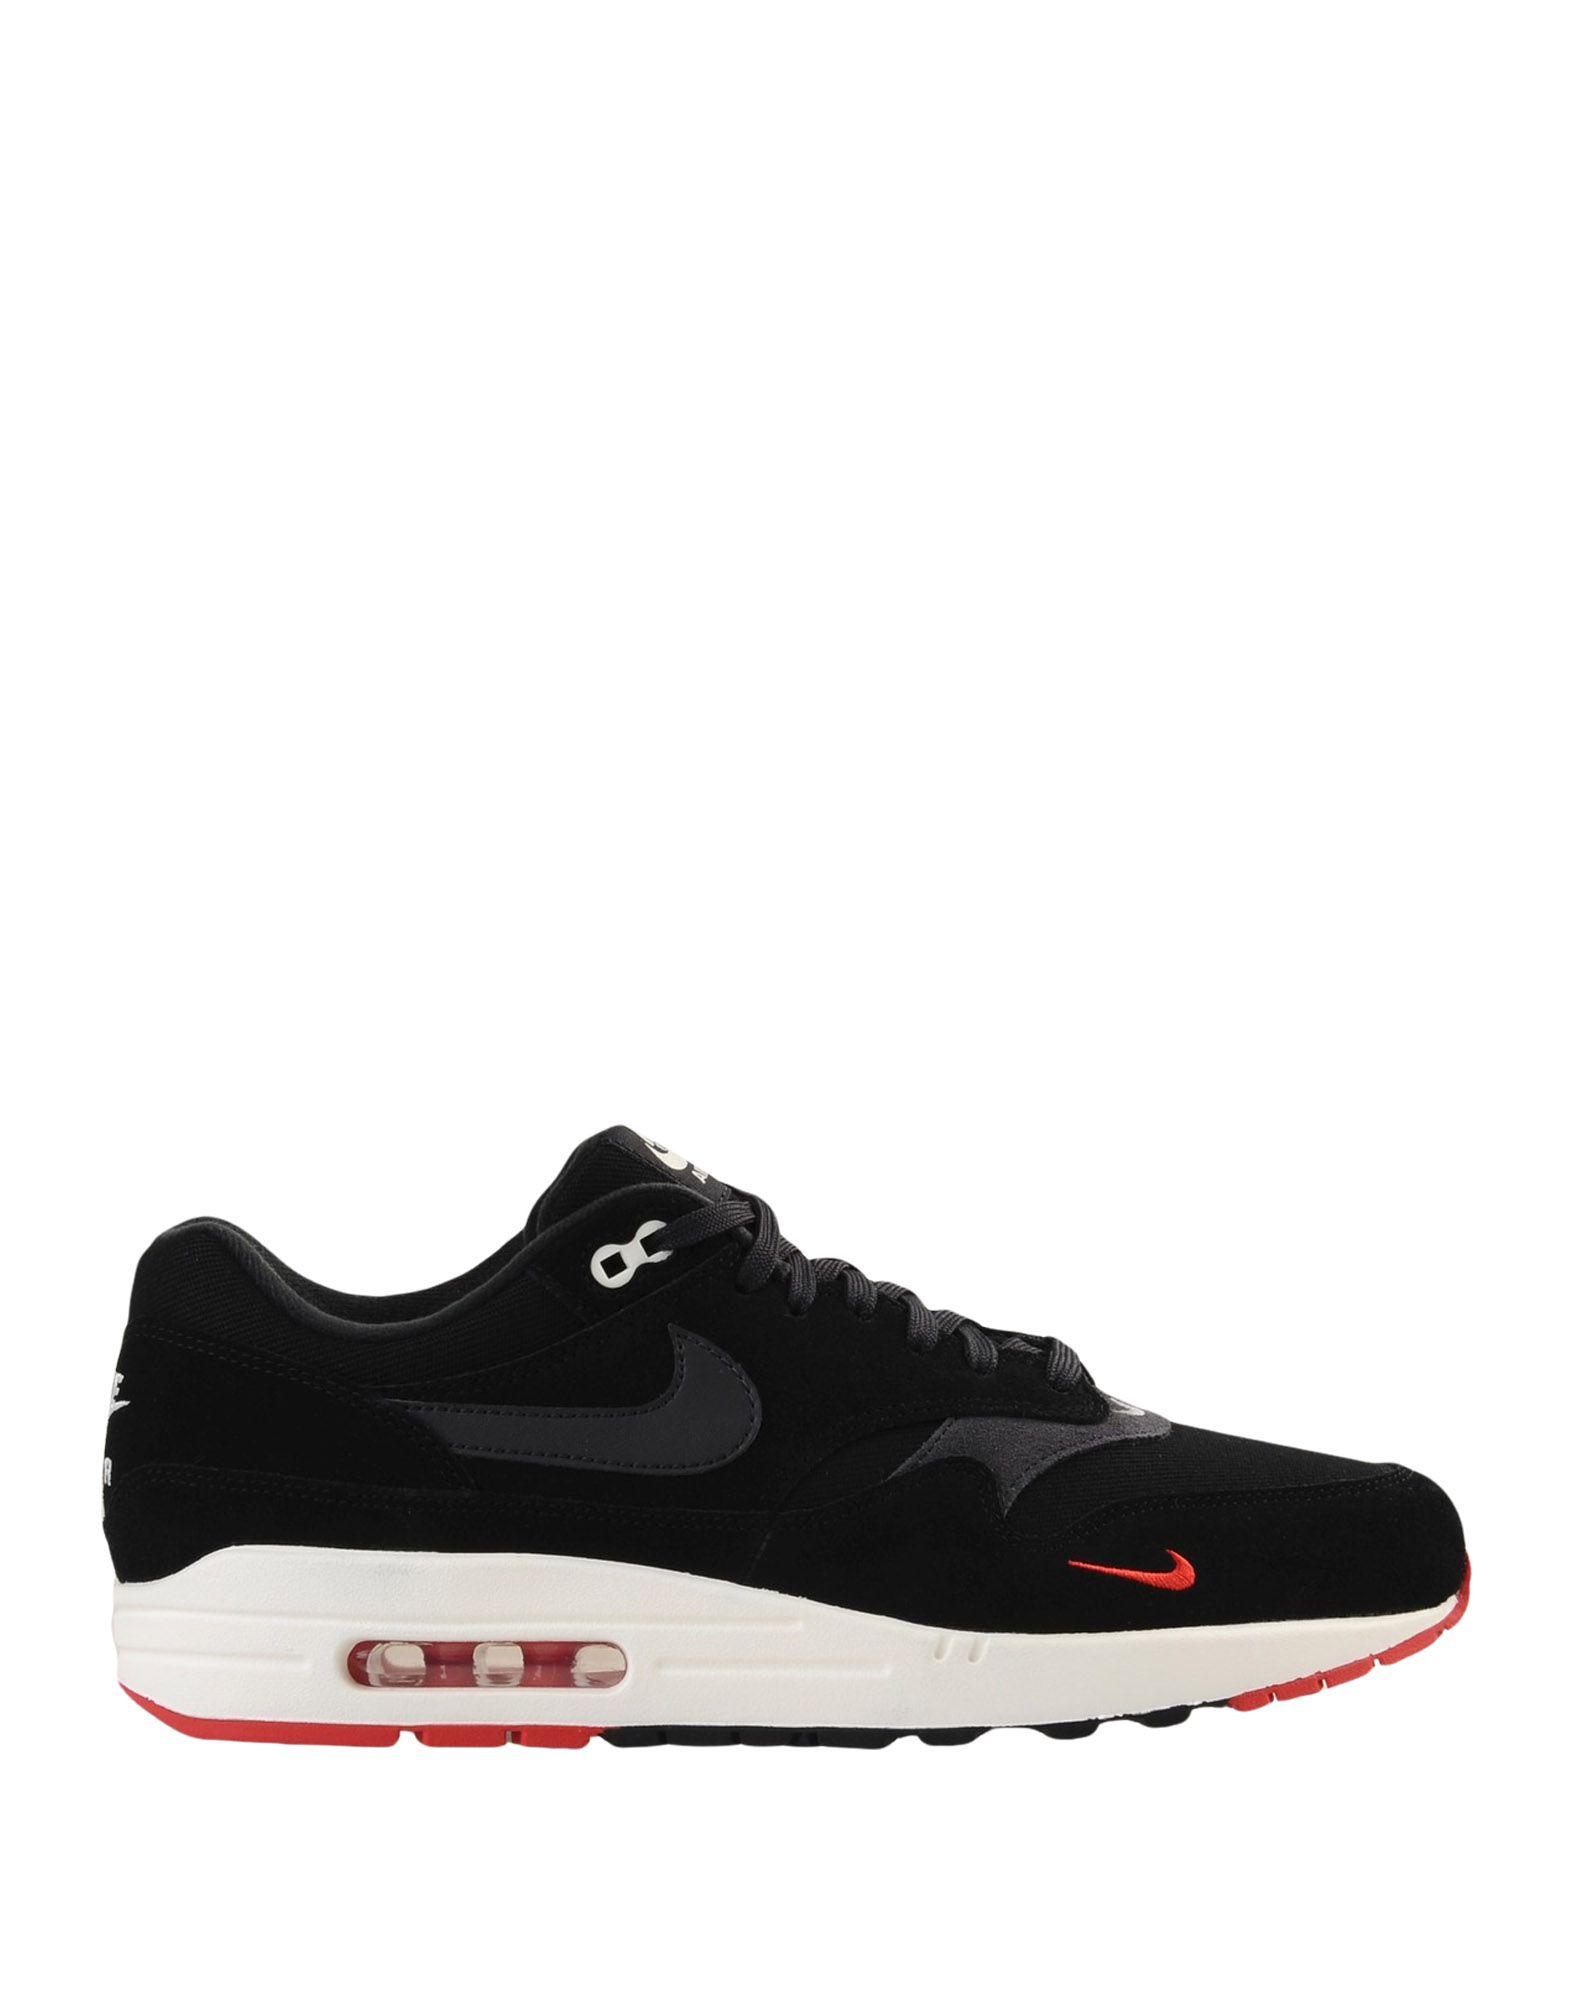 Zapatillas Nike   Hombre Air Max 1 Premium - Hombre  - Zapatillas Nike  Negro 6cdd35